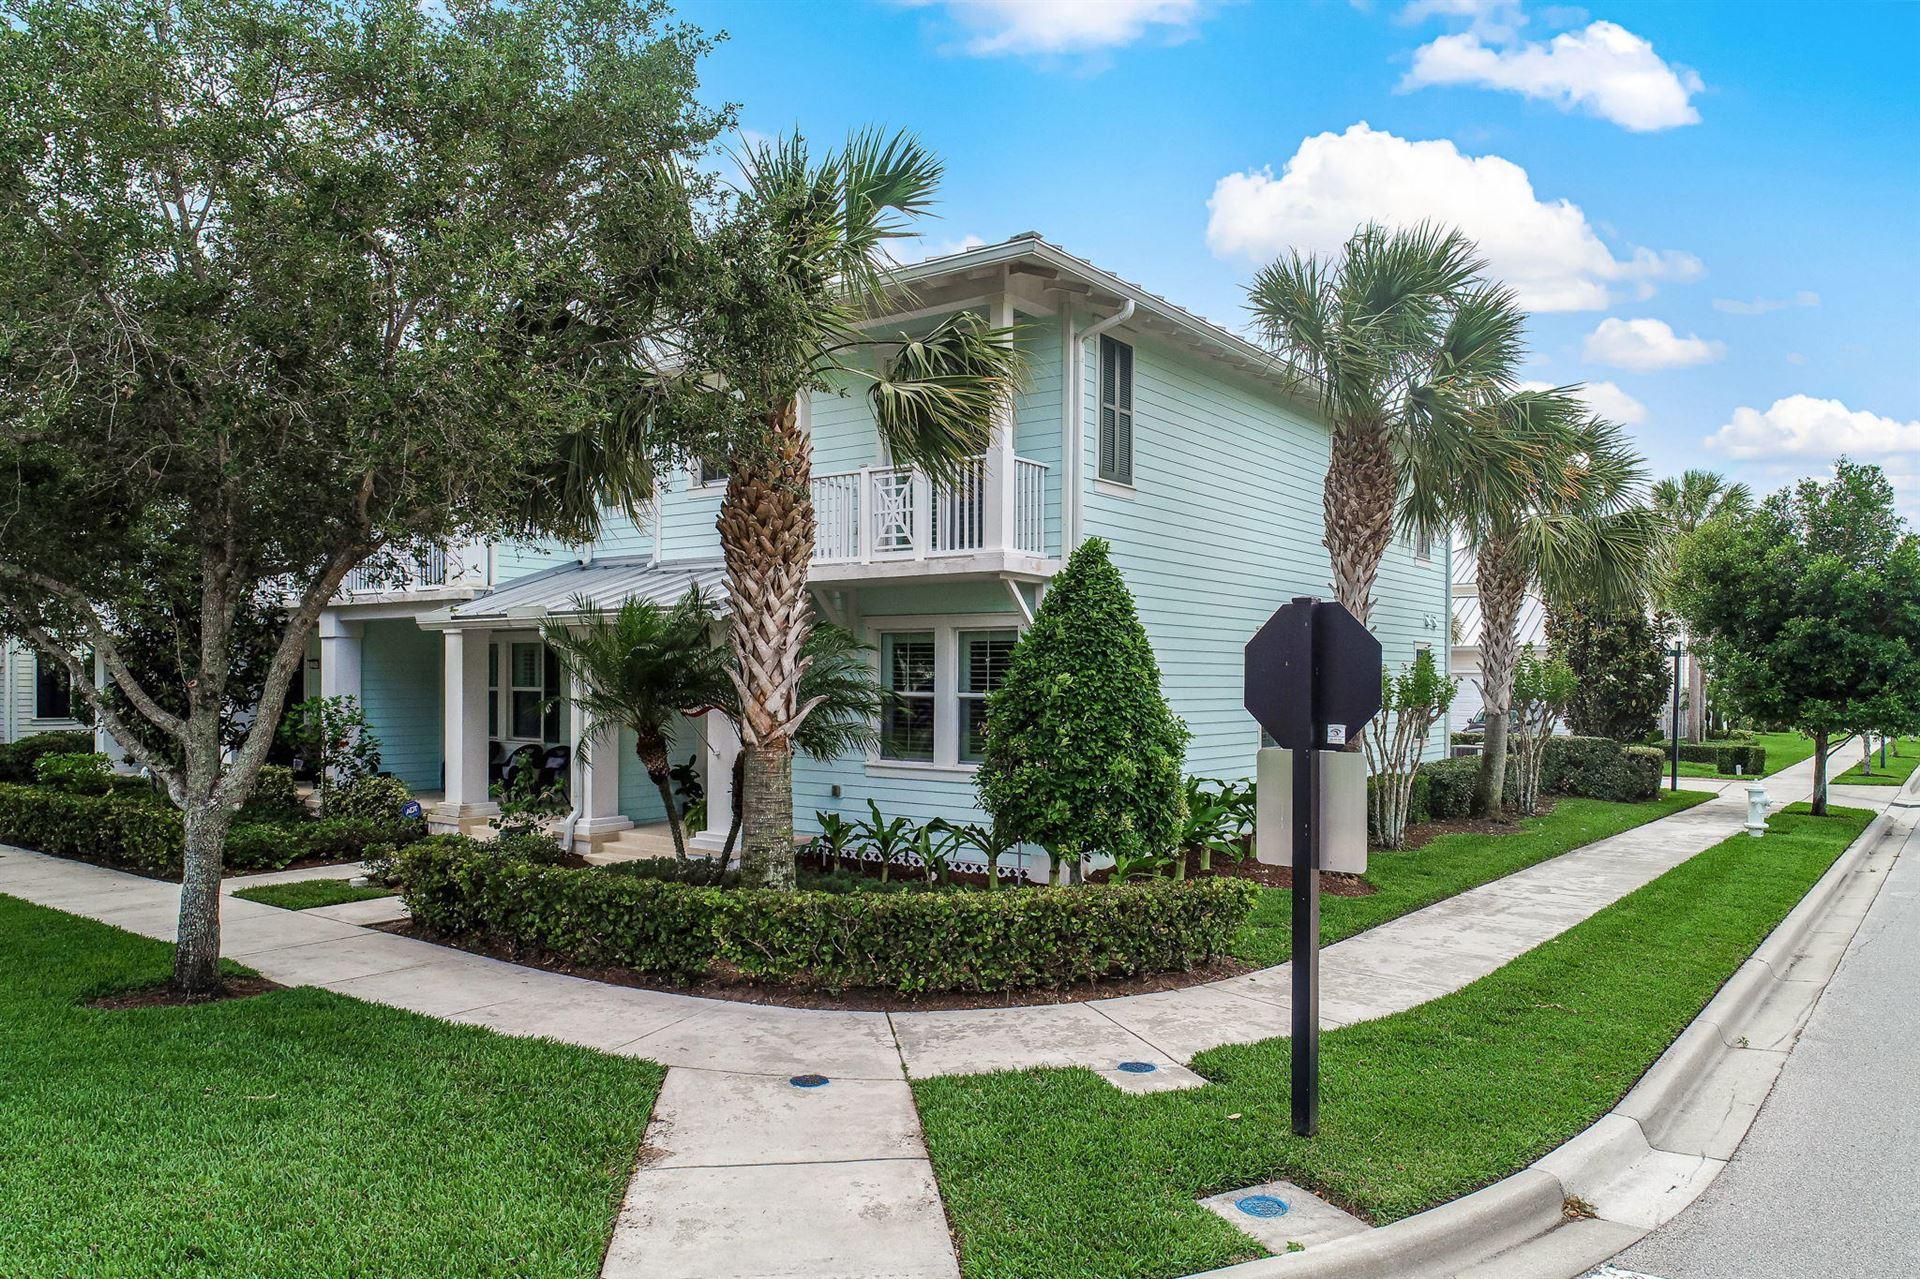 Photo of 3246 W Mallory Boulevard, Jupiter, FL 33458 (MLS # RX-10713157)